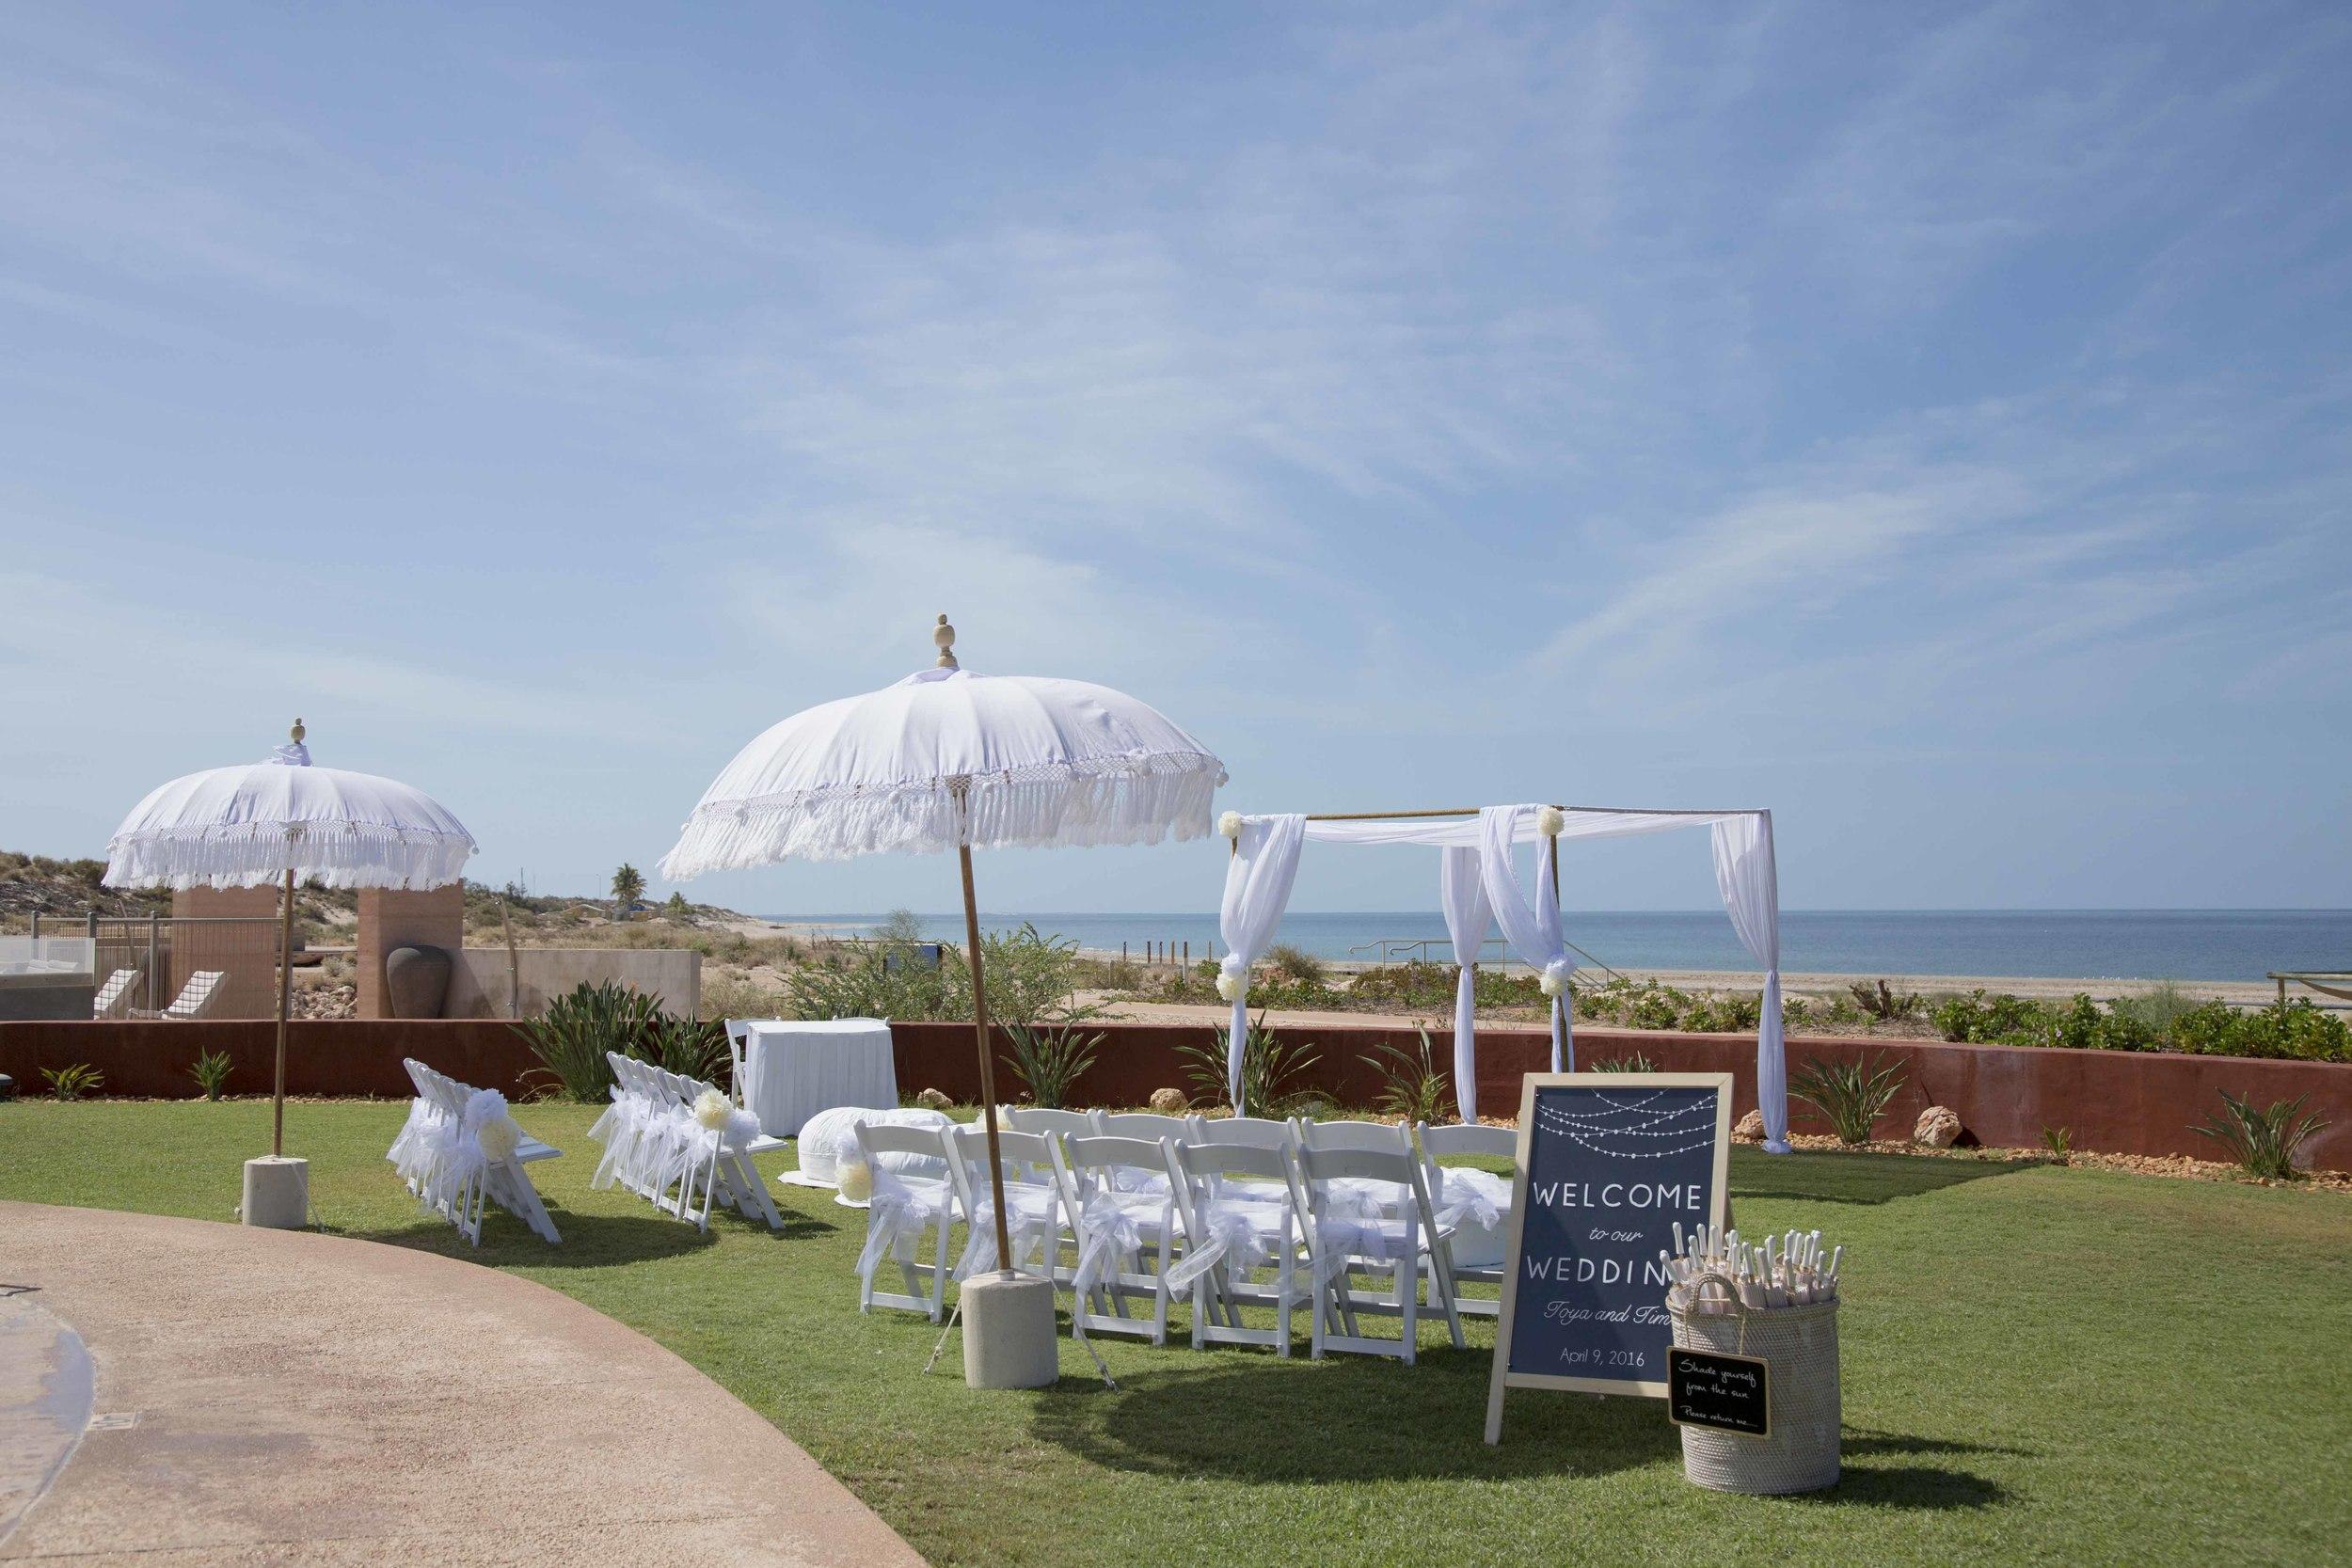 Bohemein Umbrellas, Love Structure, Gladiator Chairs, Customised Board,